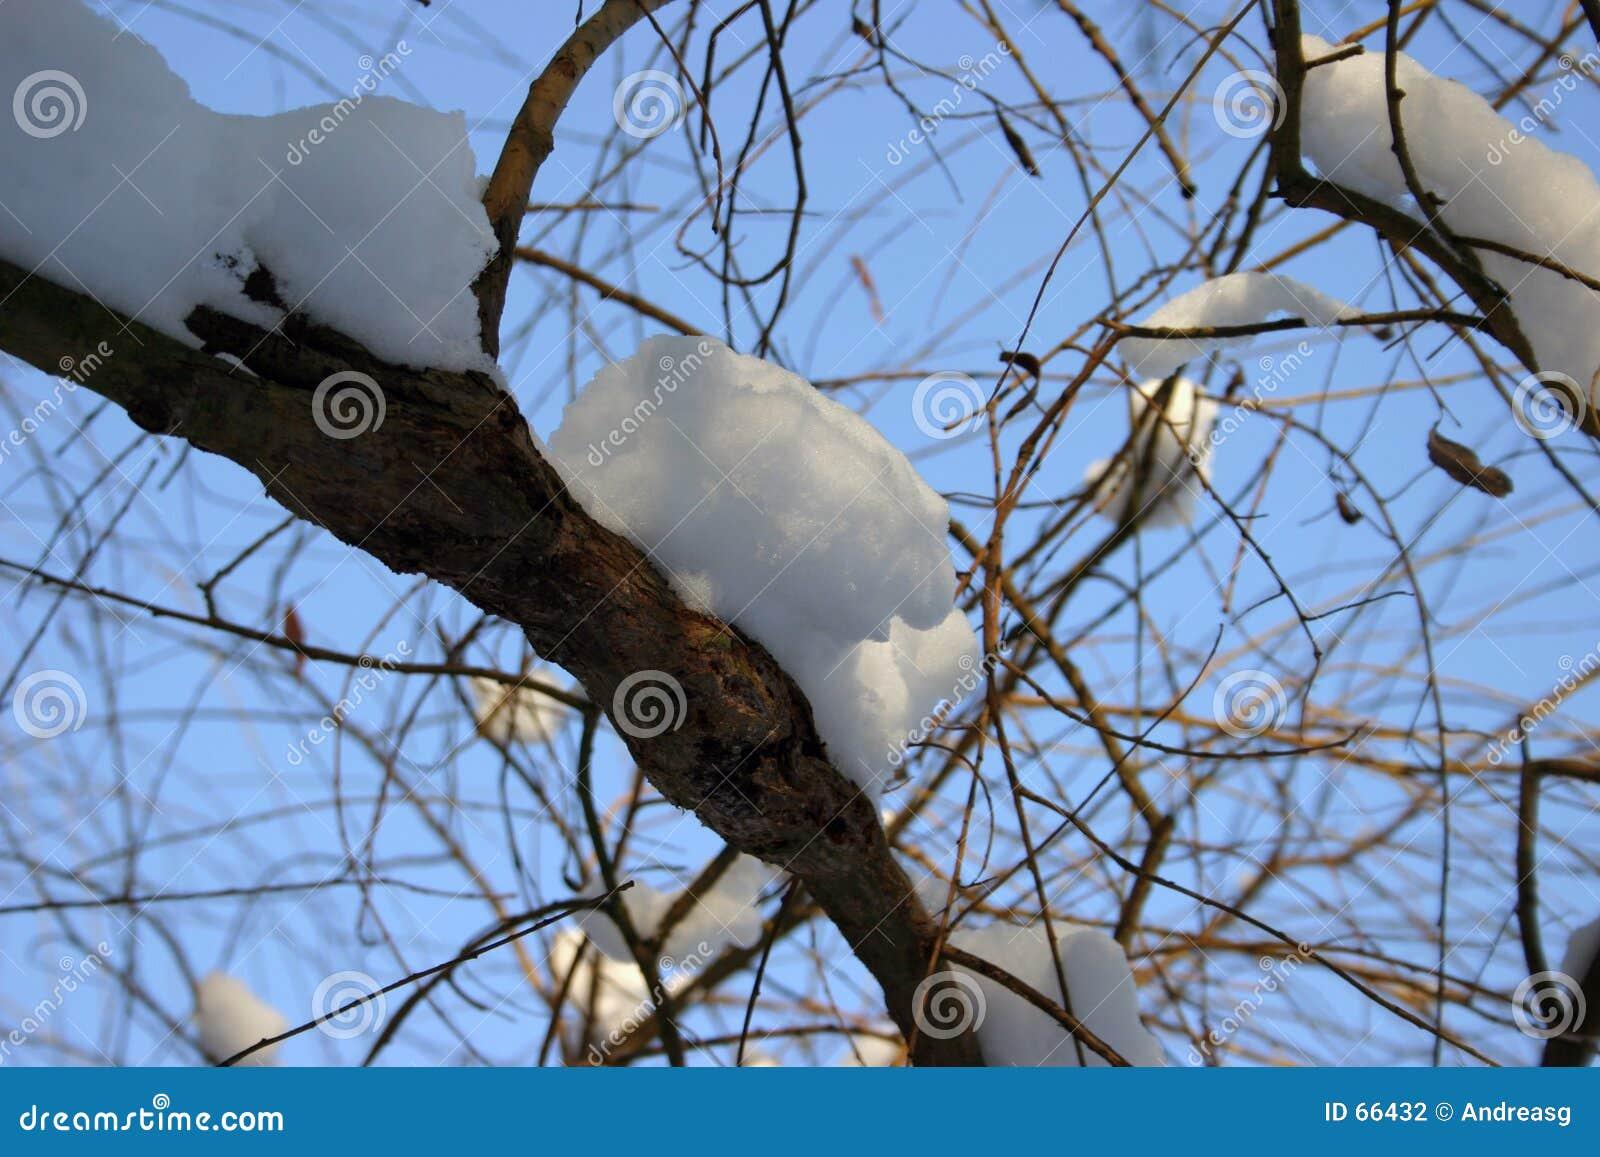 Snow on branch 2